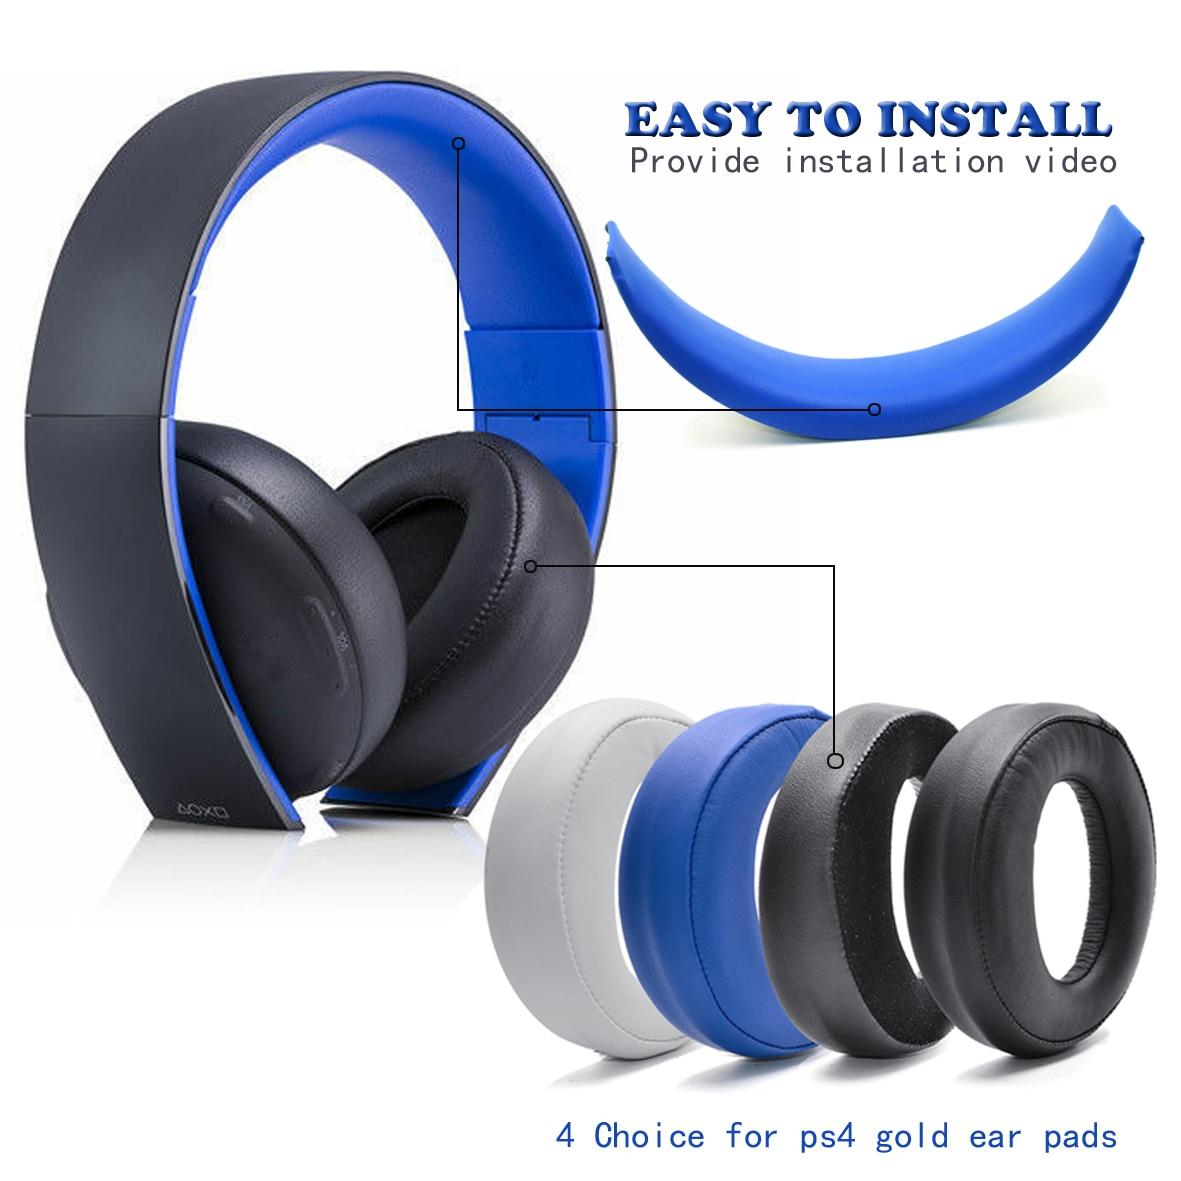 Wireless Headset Earpads For Sony Gold Wireless Headphone PS3 PS4 7.1 Phone Stereo Headfone Big Earmuff Audio Headset Earphone